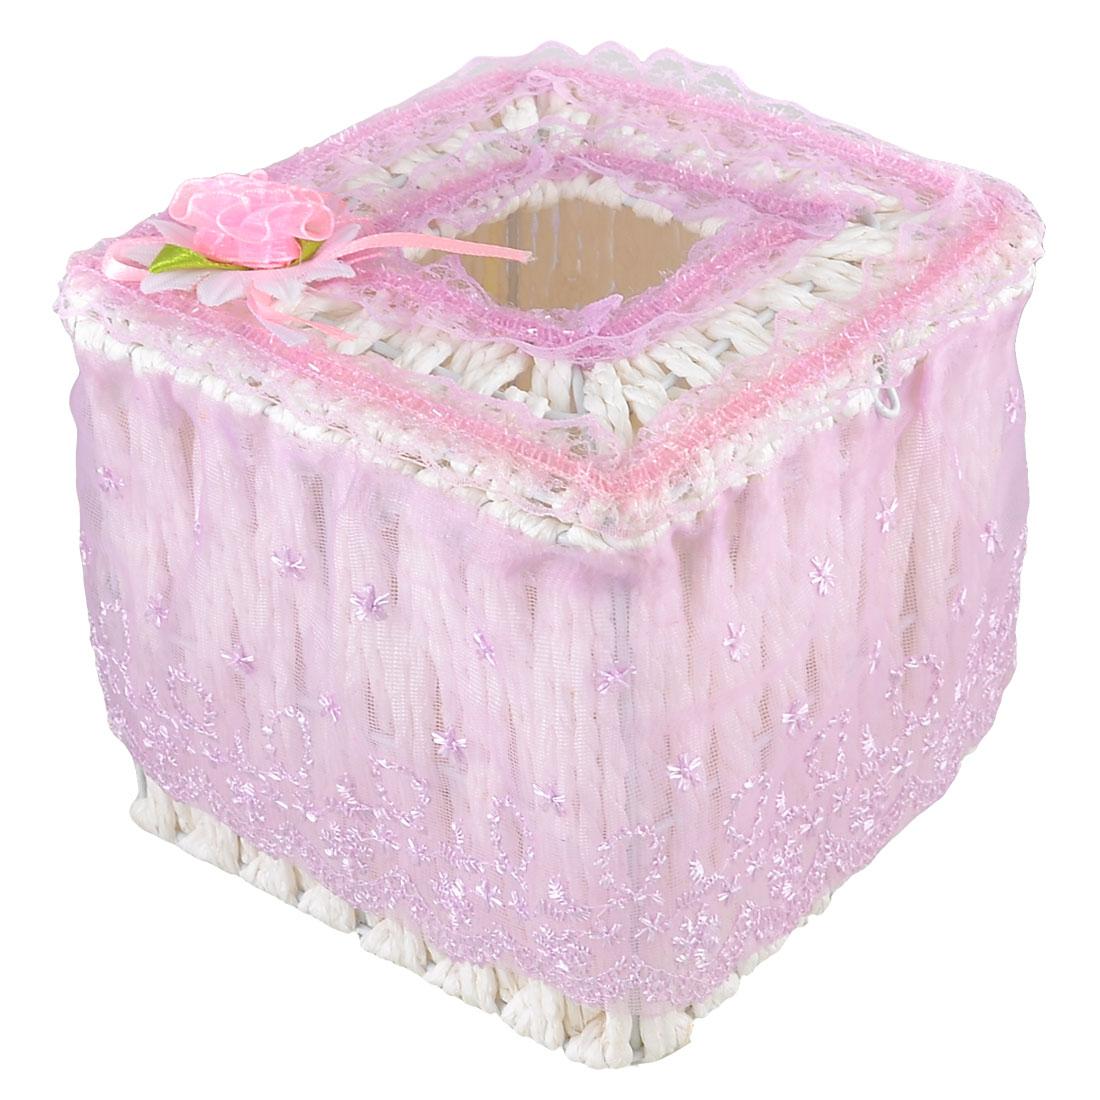 Light Purple Floral Lace Detailed Square Shape White Woven Tissue Box Case